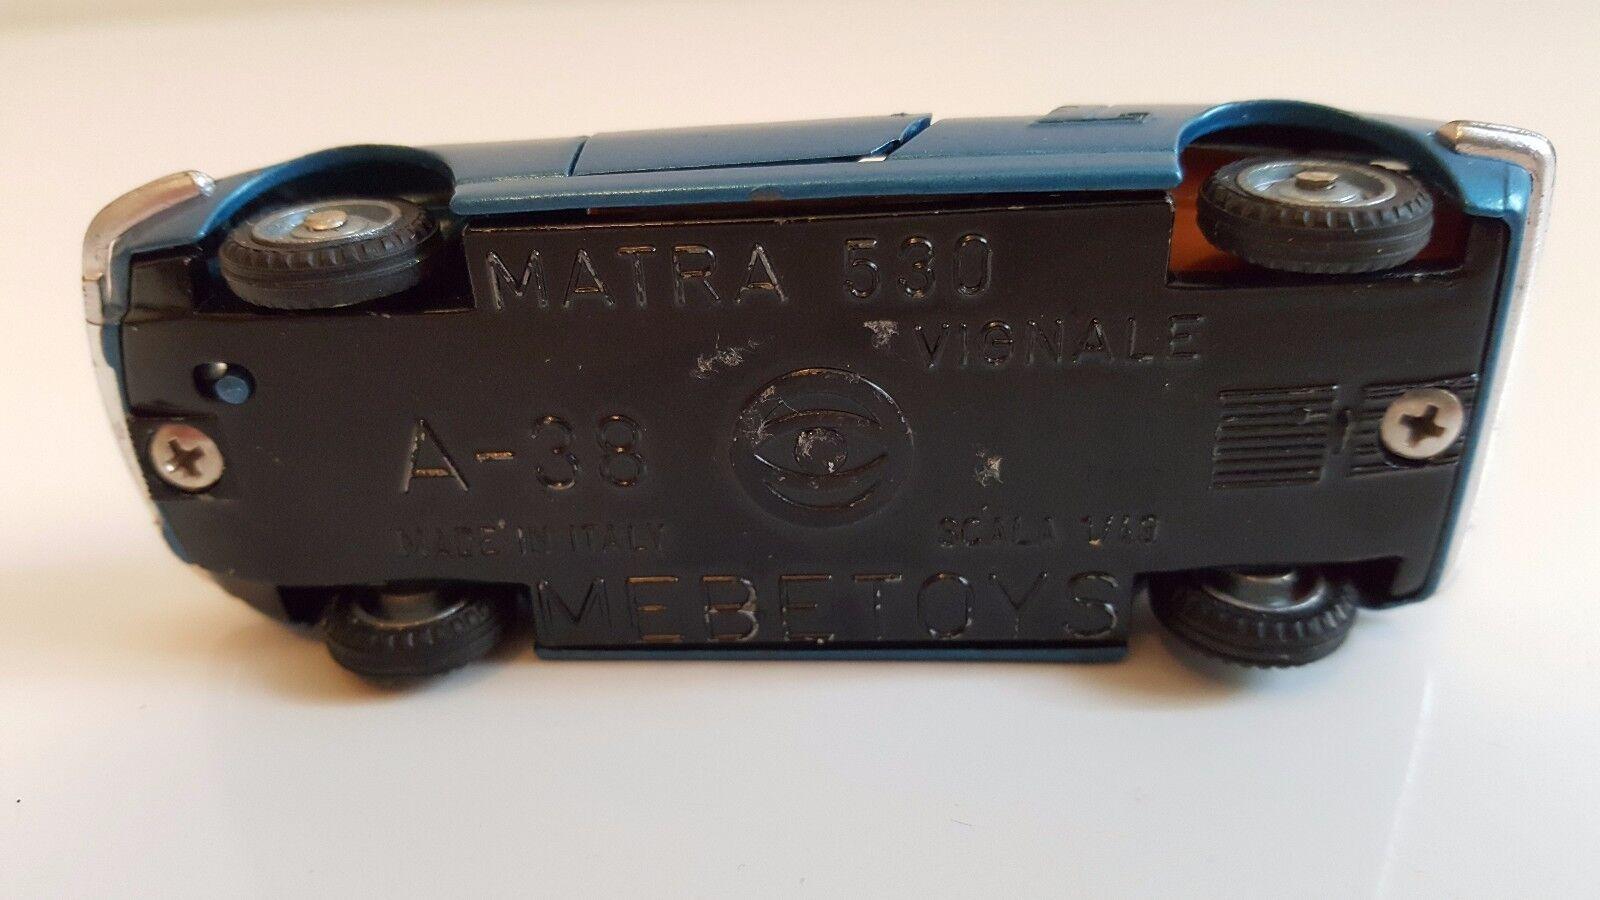 Mebetoys - A-38 - - - Matra 530 Vignale aa911c